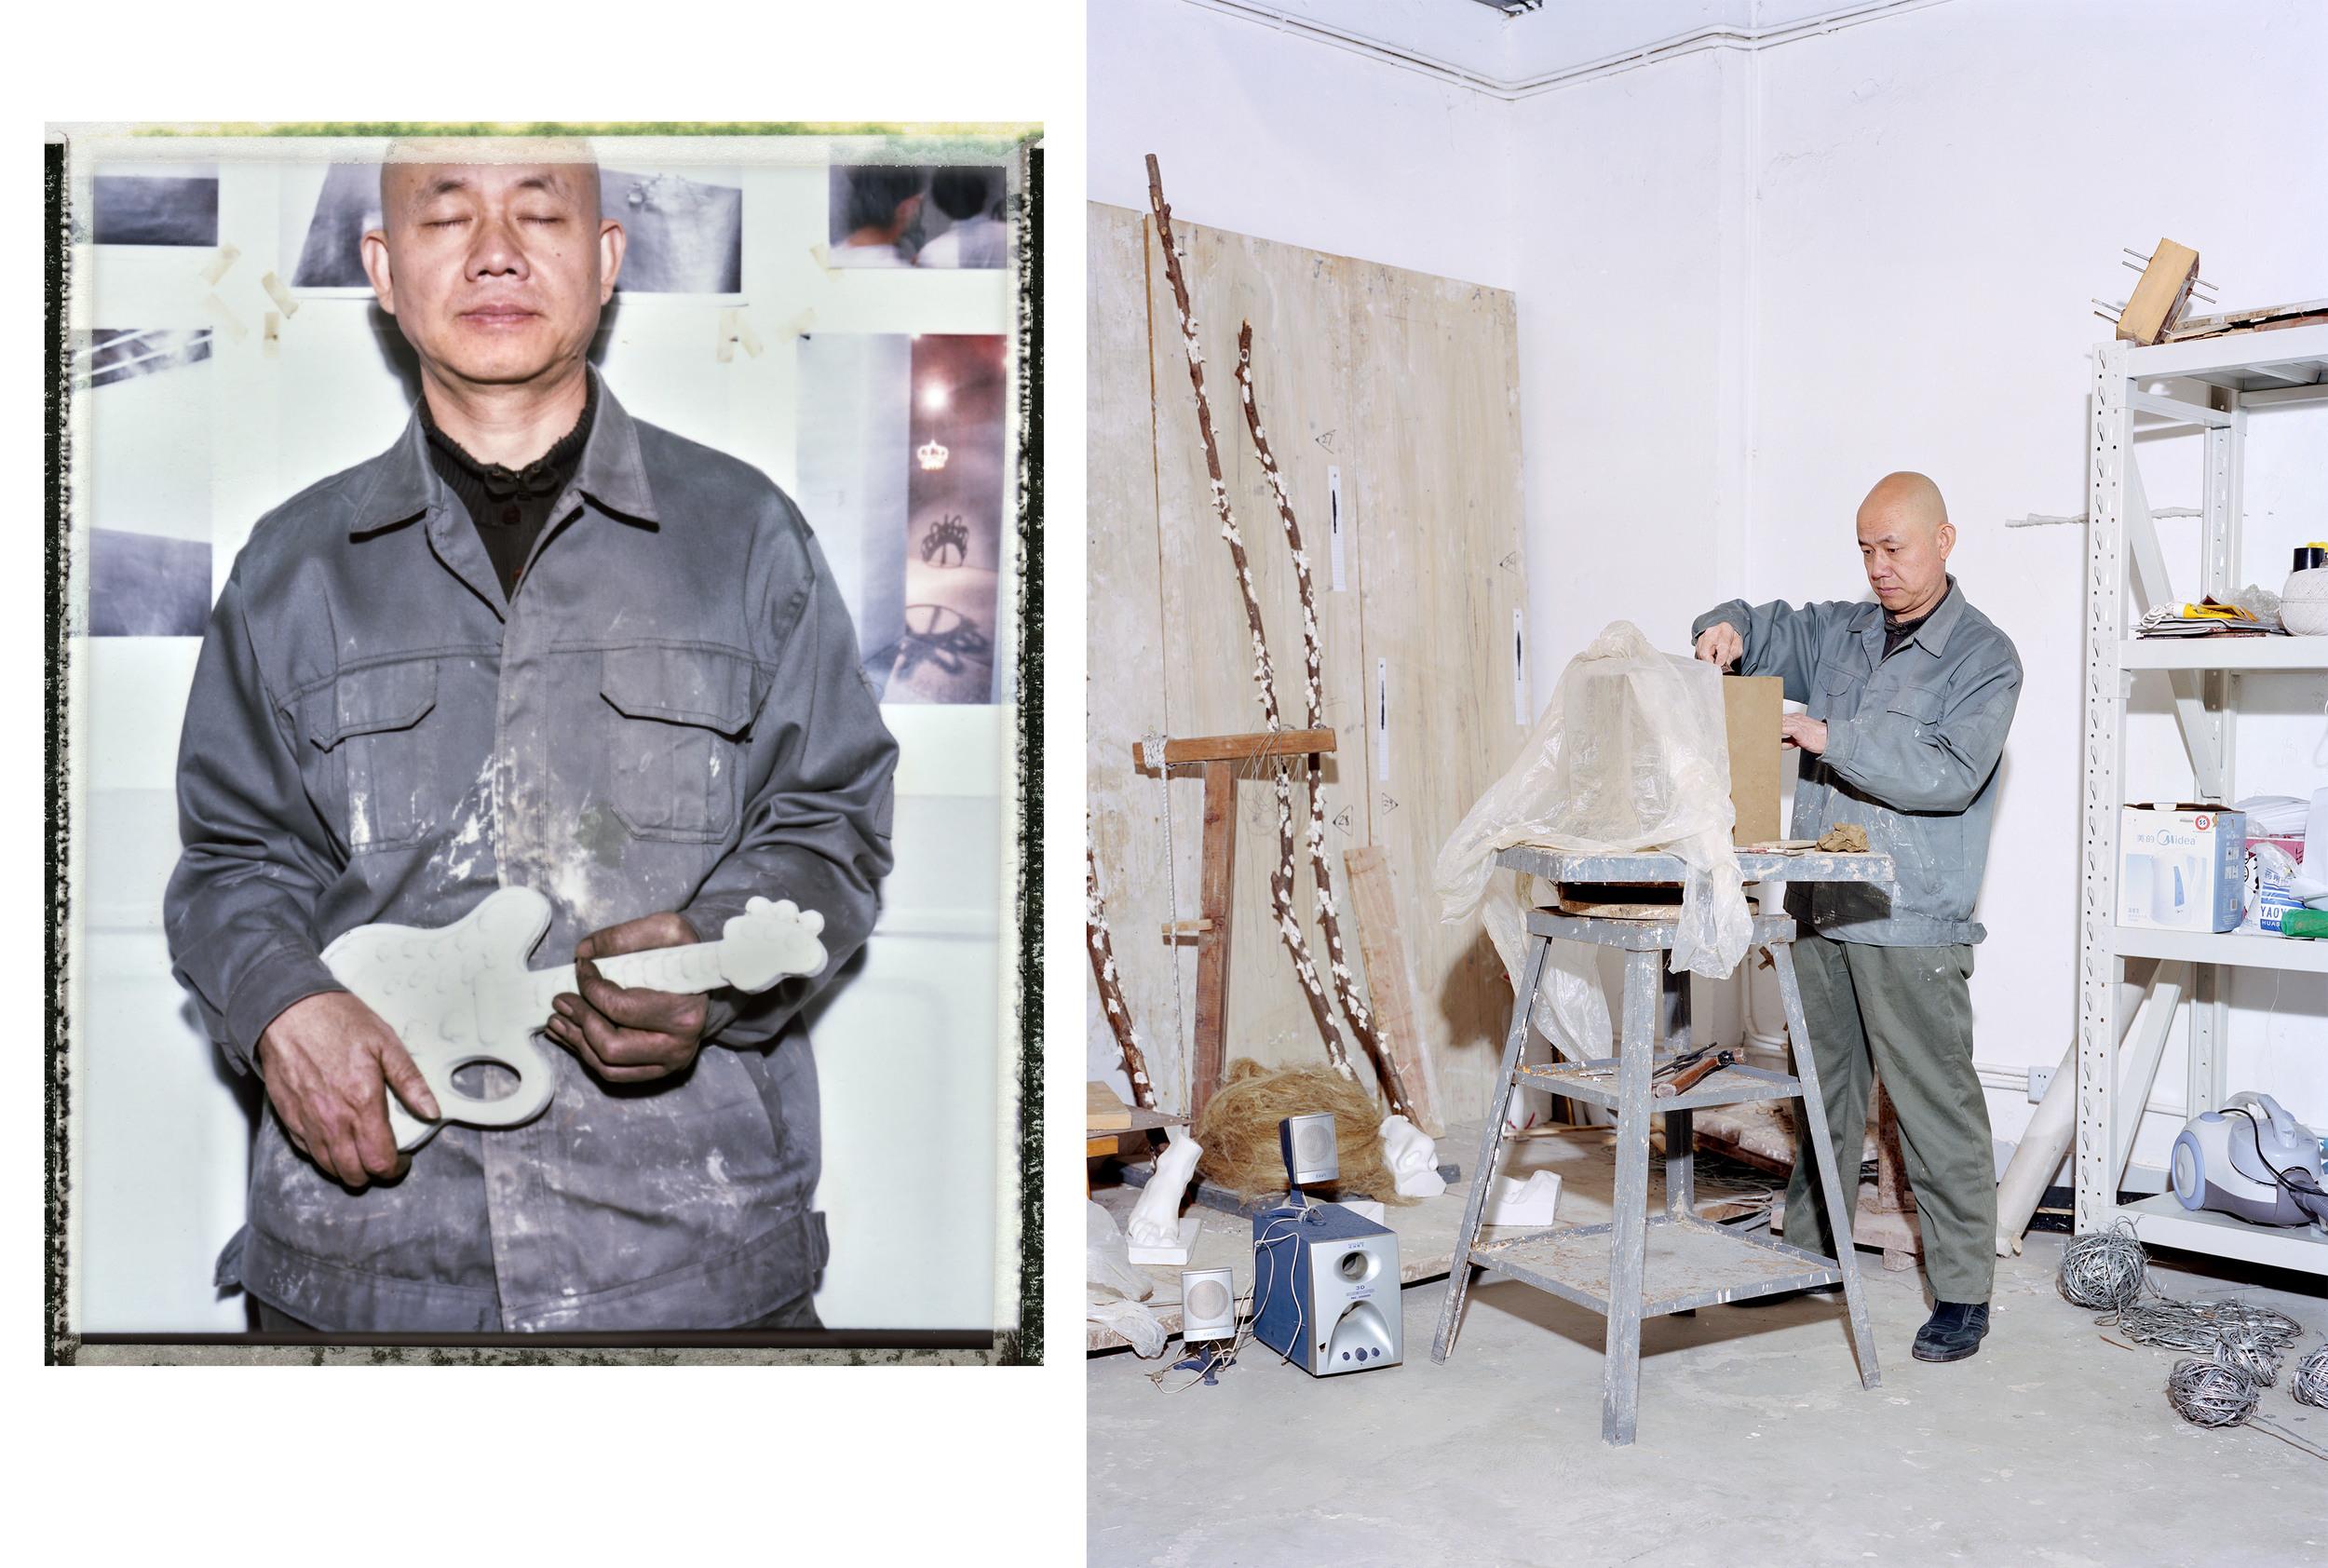 Artist Liu Jian Hua